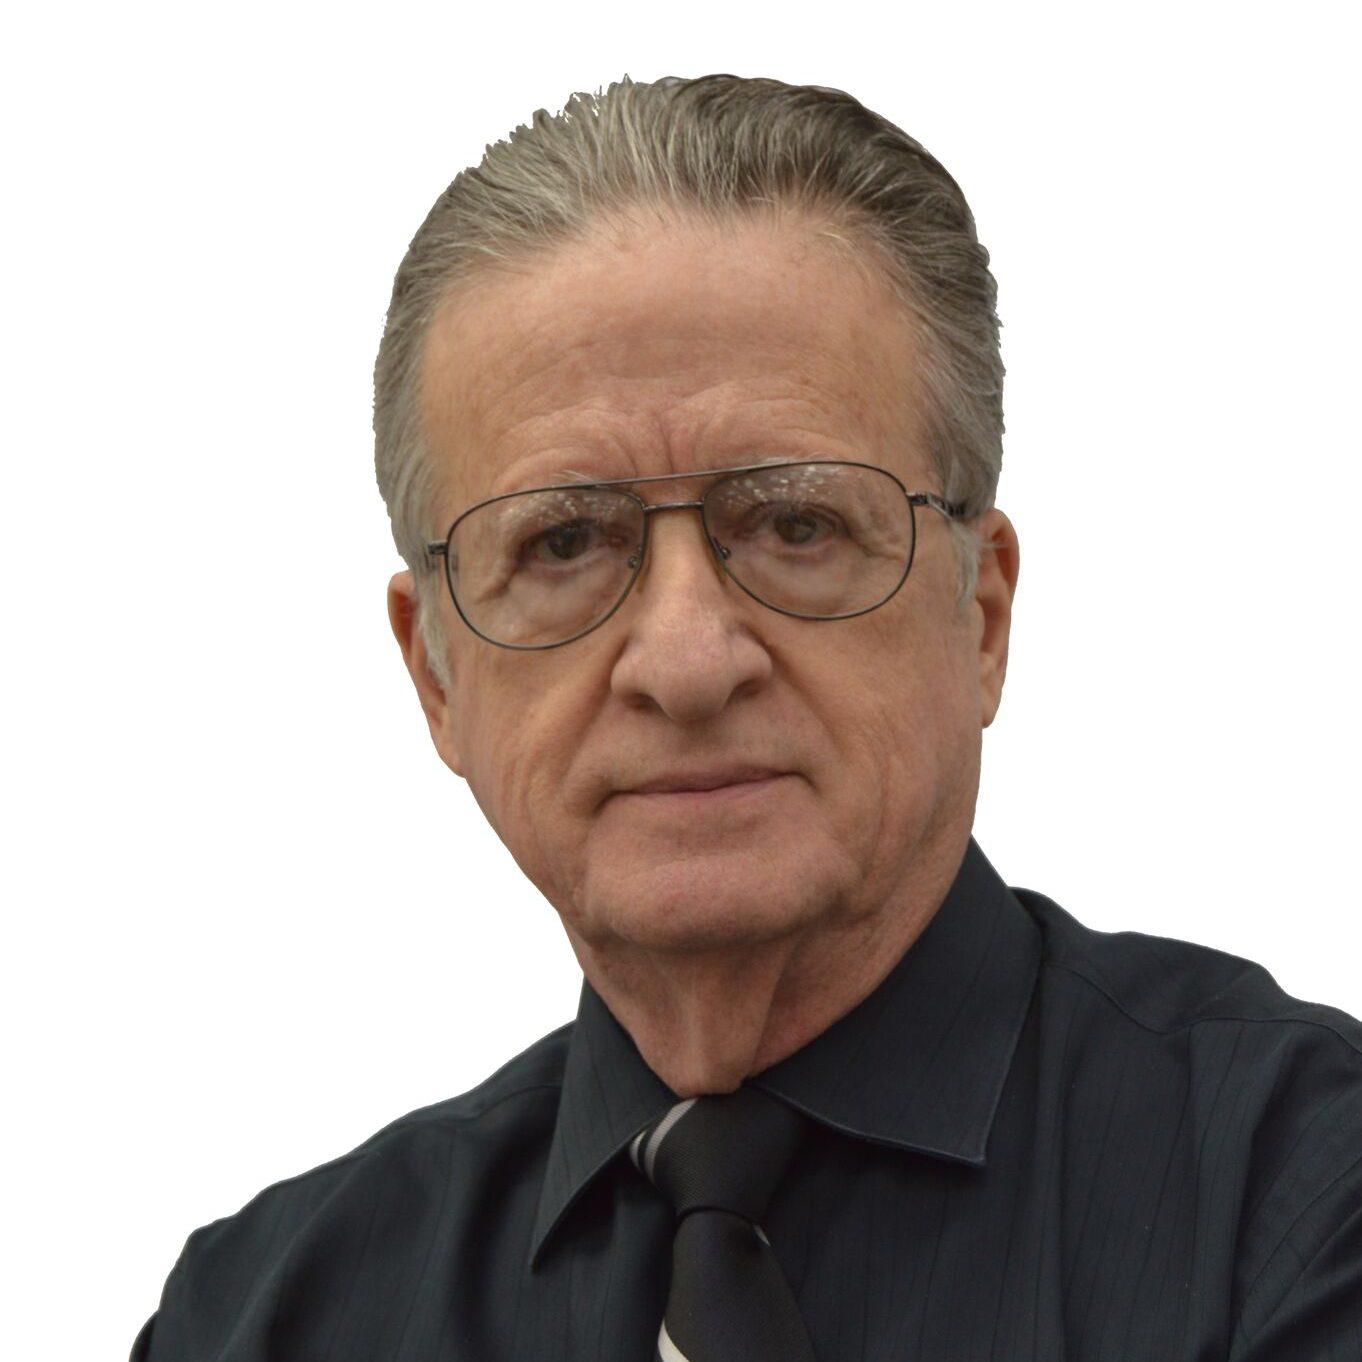 RobertRusso